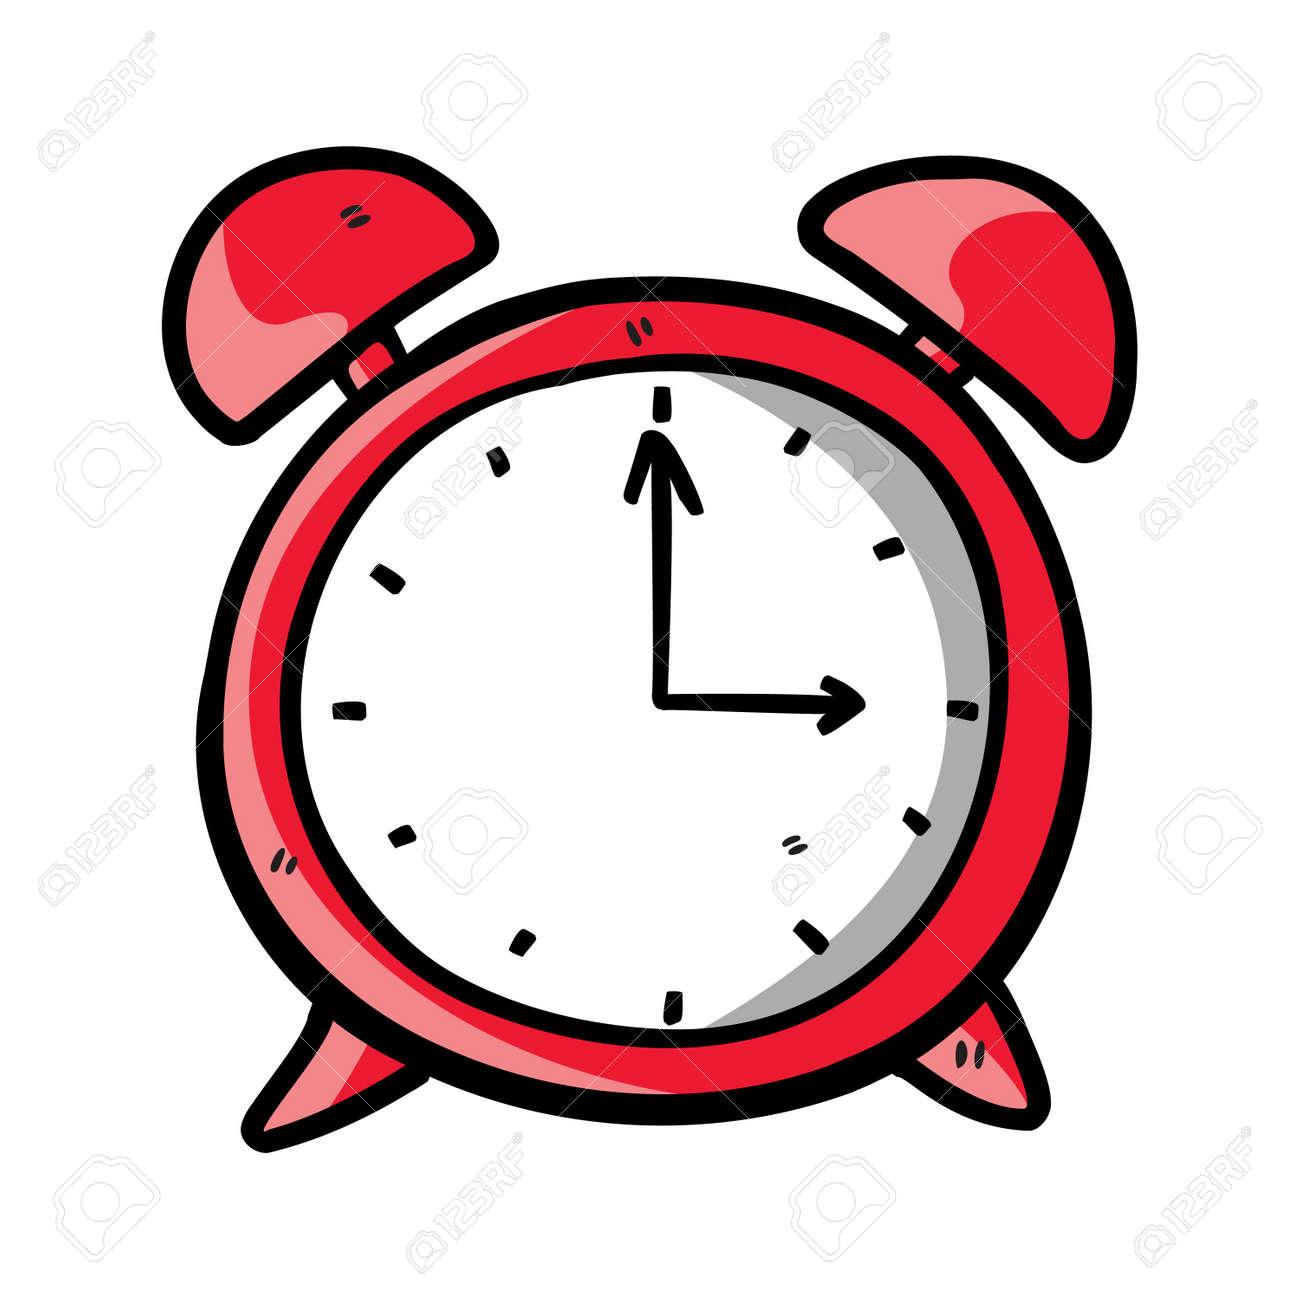 http://previews.123rf.com/images/hatza/hatza1204/hatza120400223/13194942-reloj-de-dibujo-de-color-rojo-Foto-de-archivo.jpg